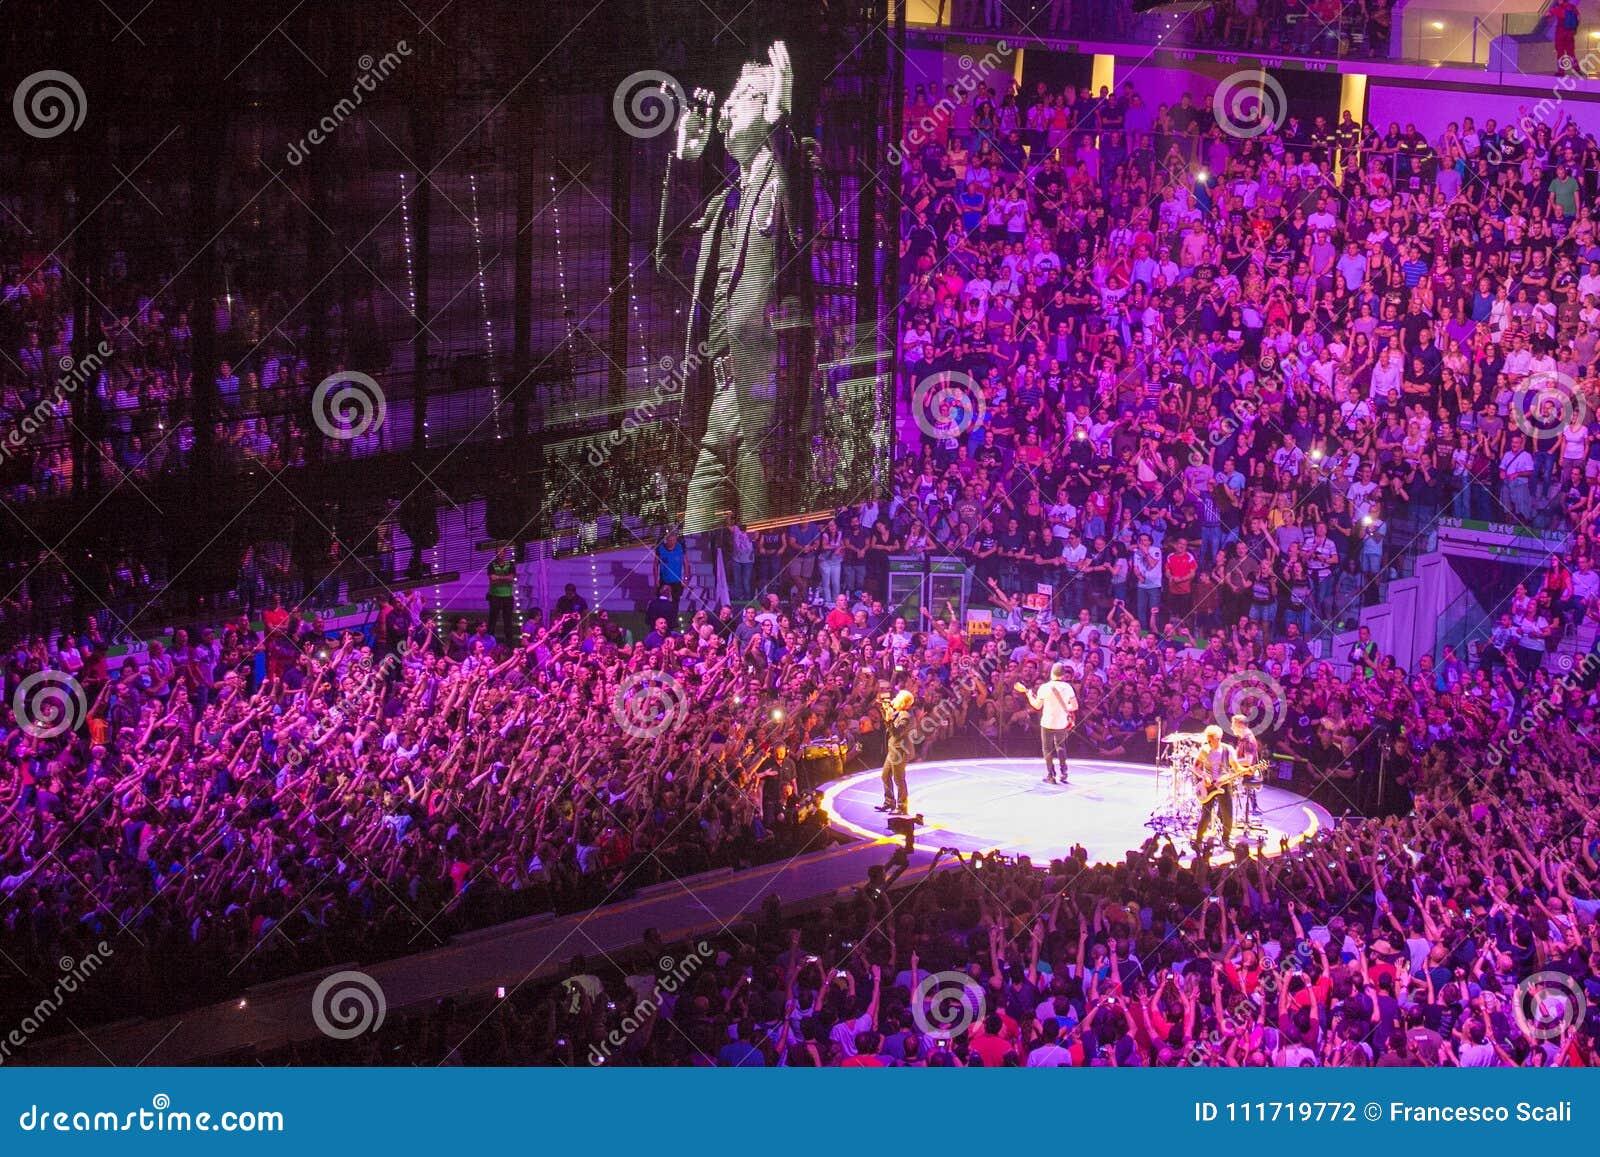 Bande U2 jouant de concert à Milan